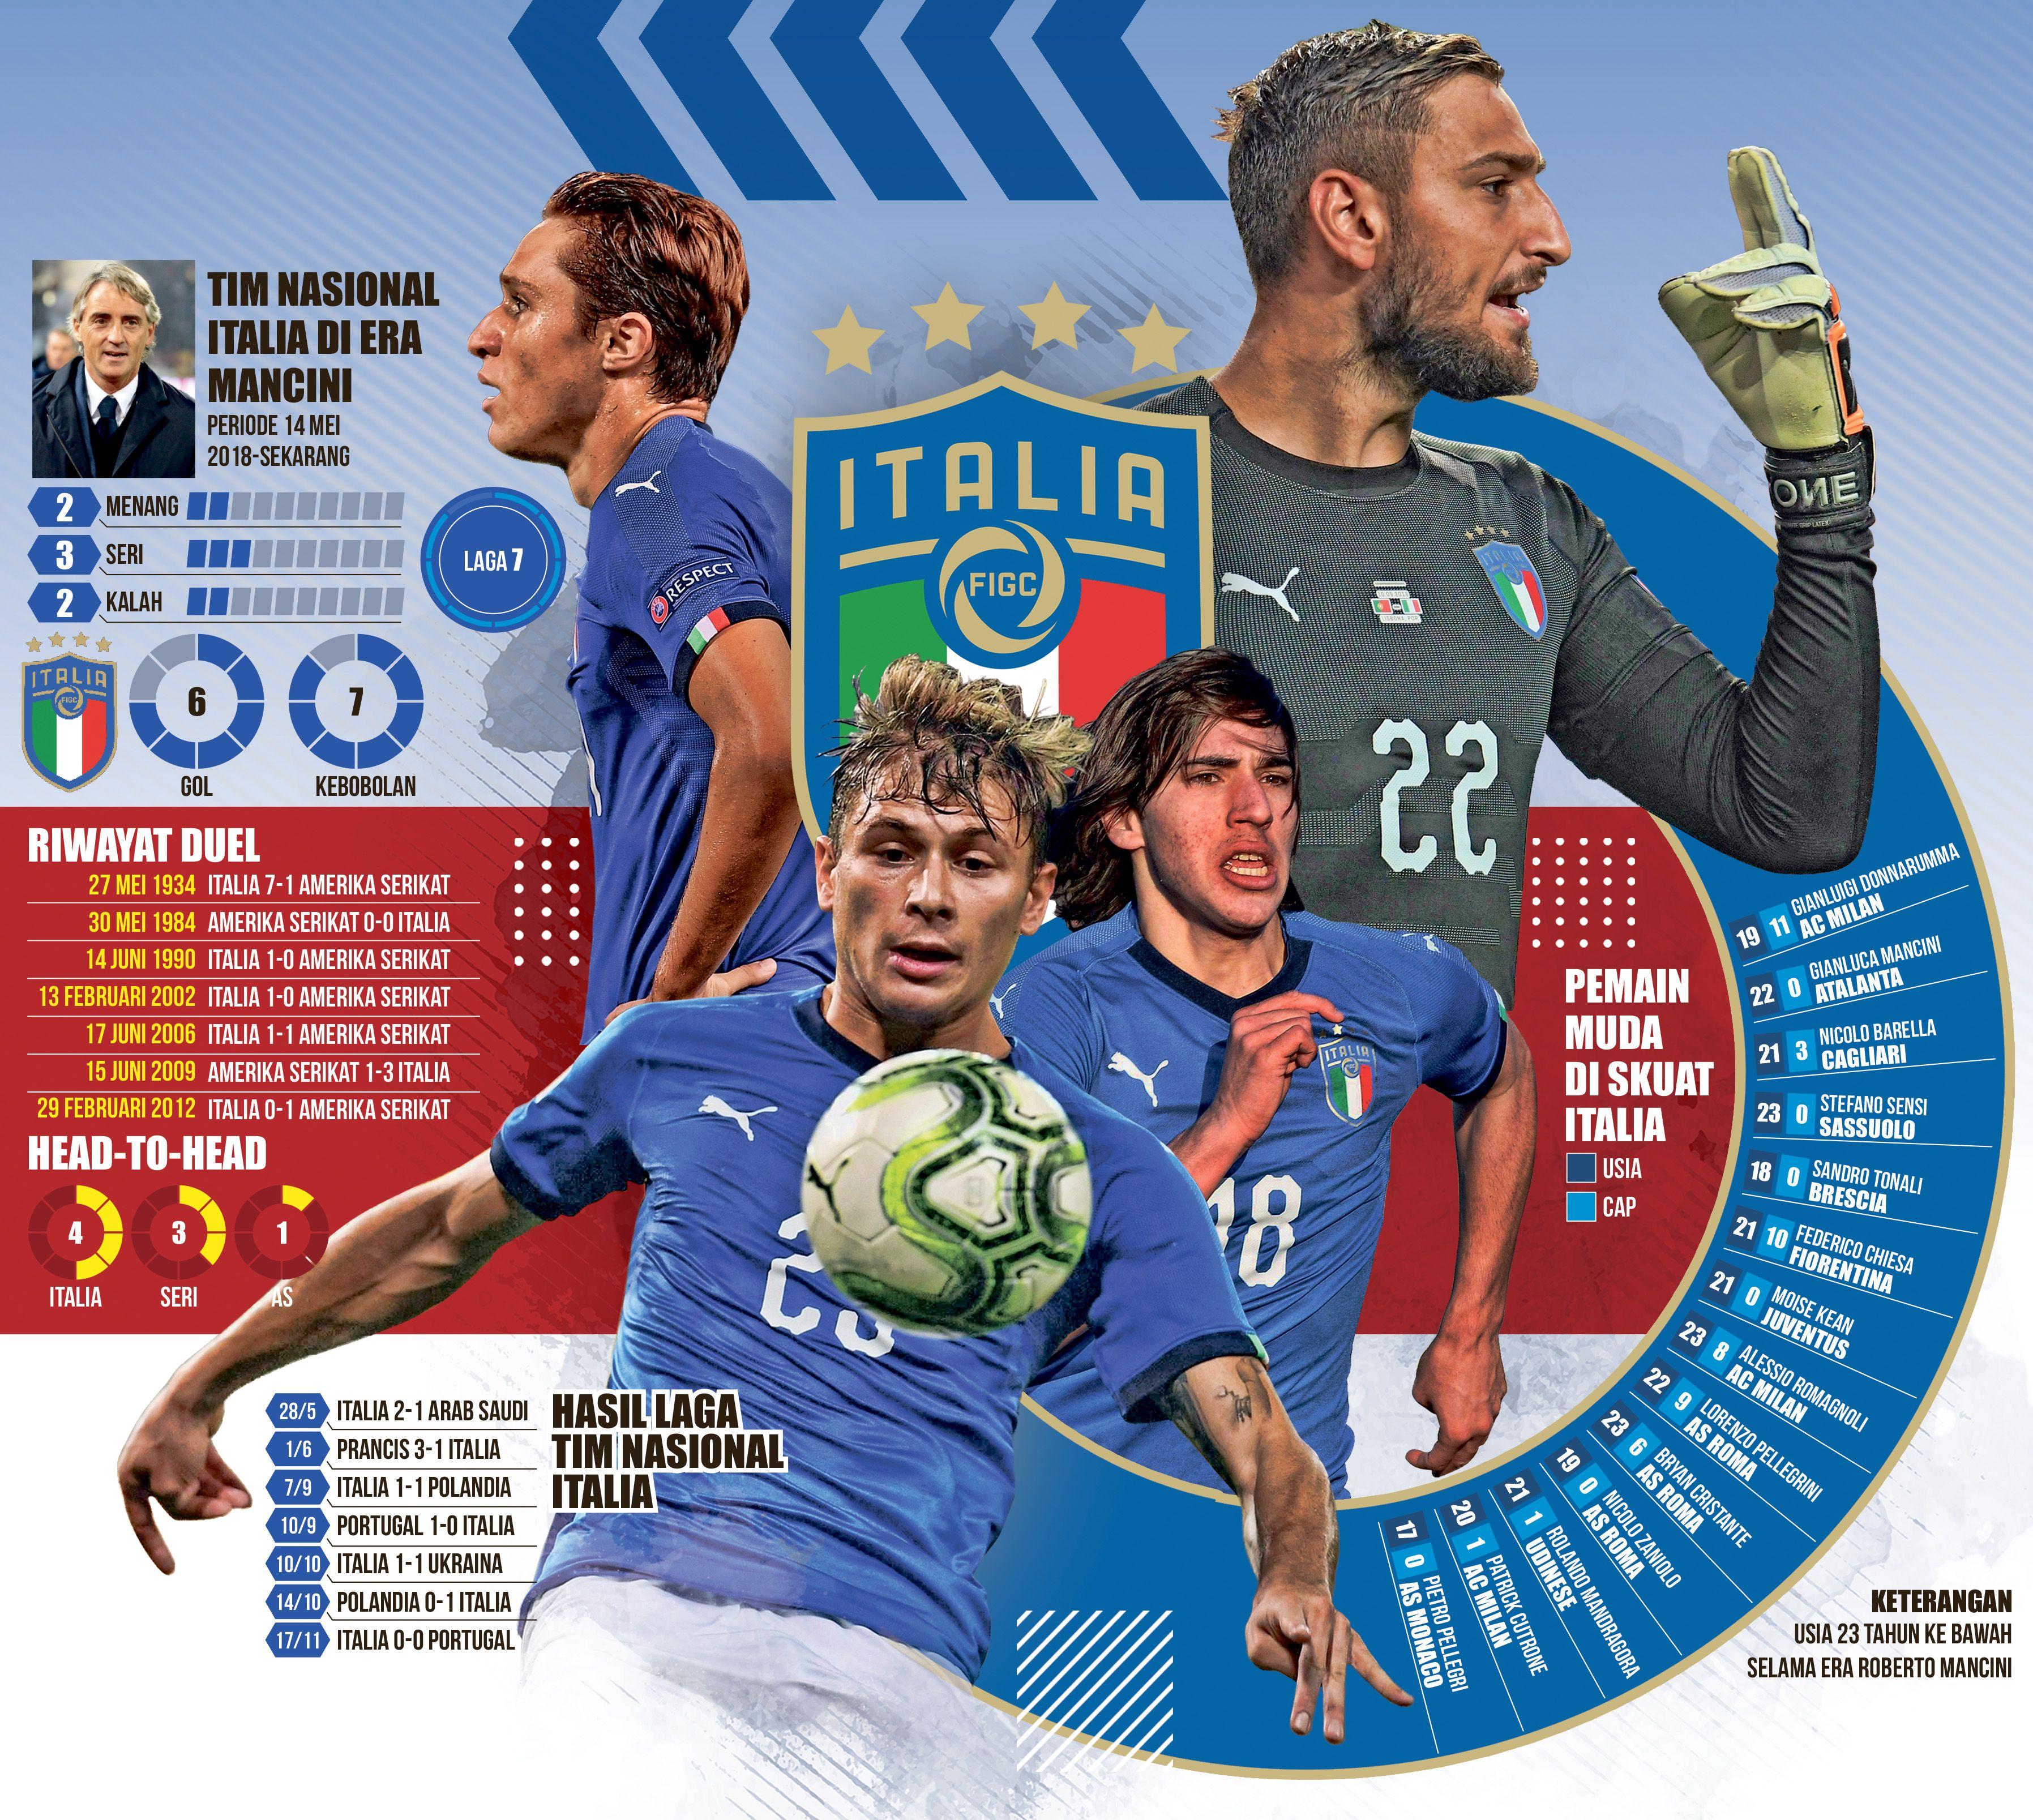 infographic newspaper epaper sport football soccer